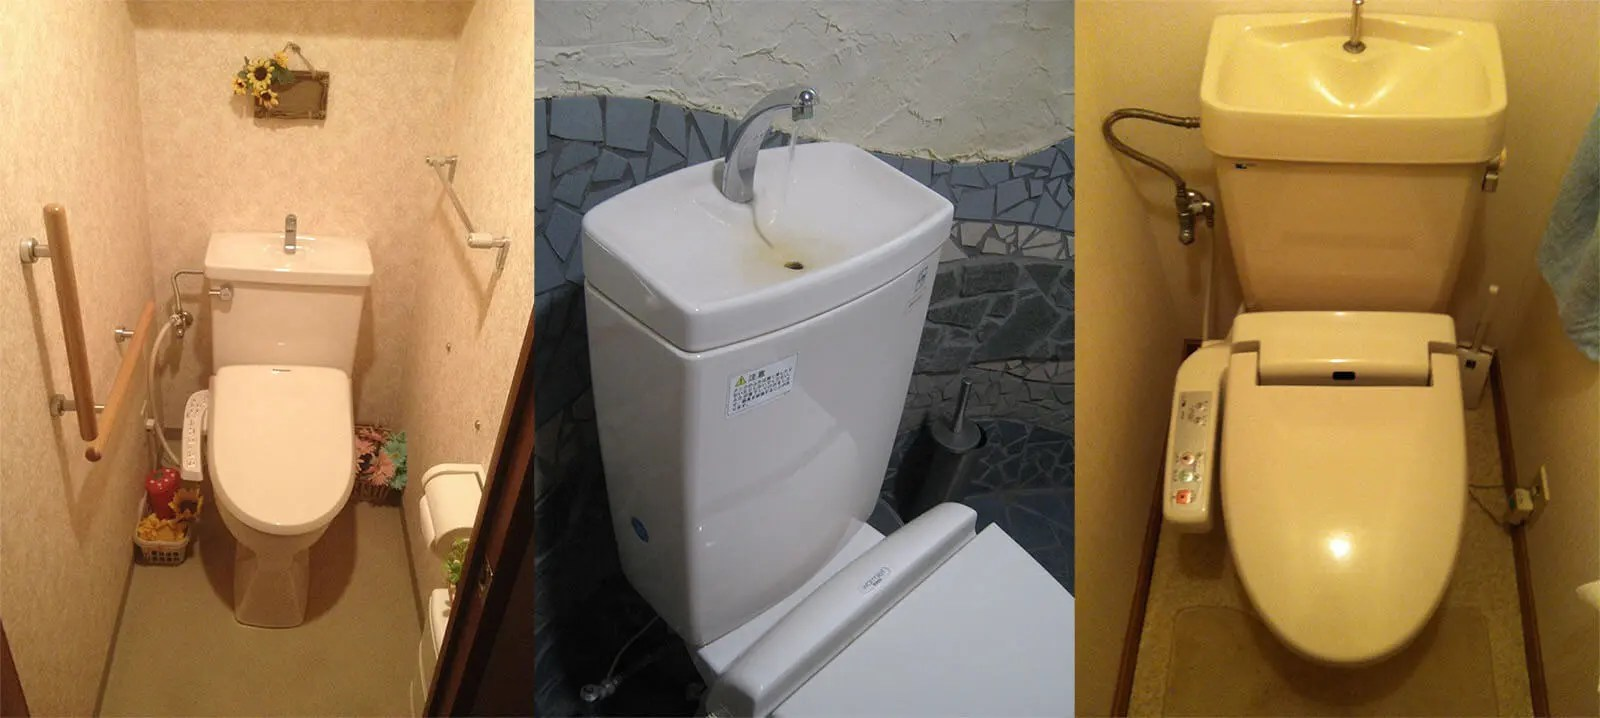 Japanese Toilets: Impressive, Futuristic And Daunting